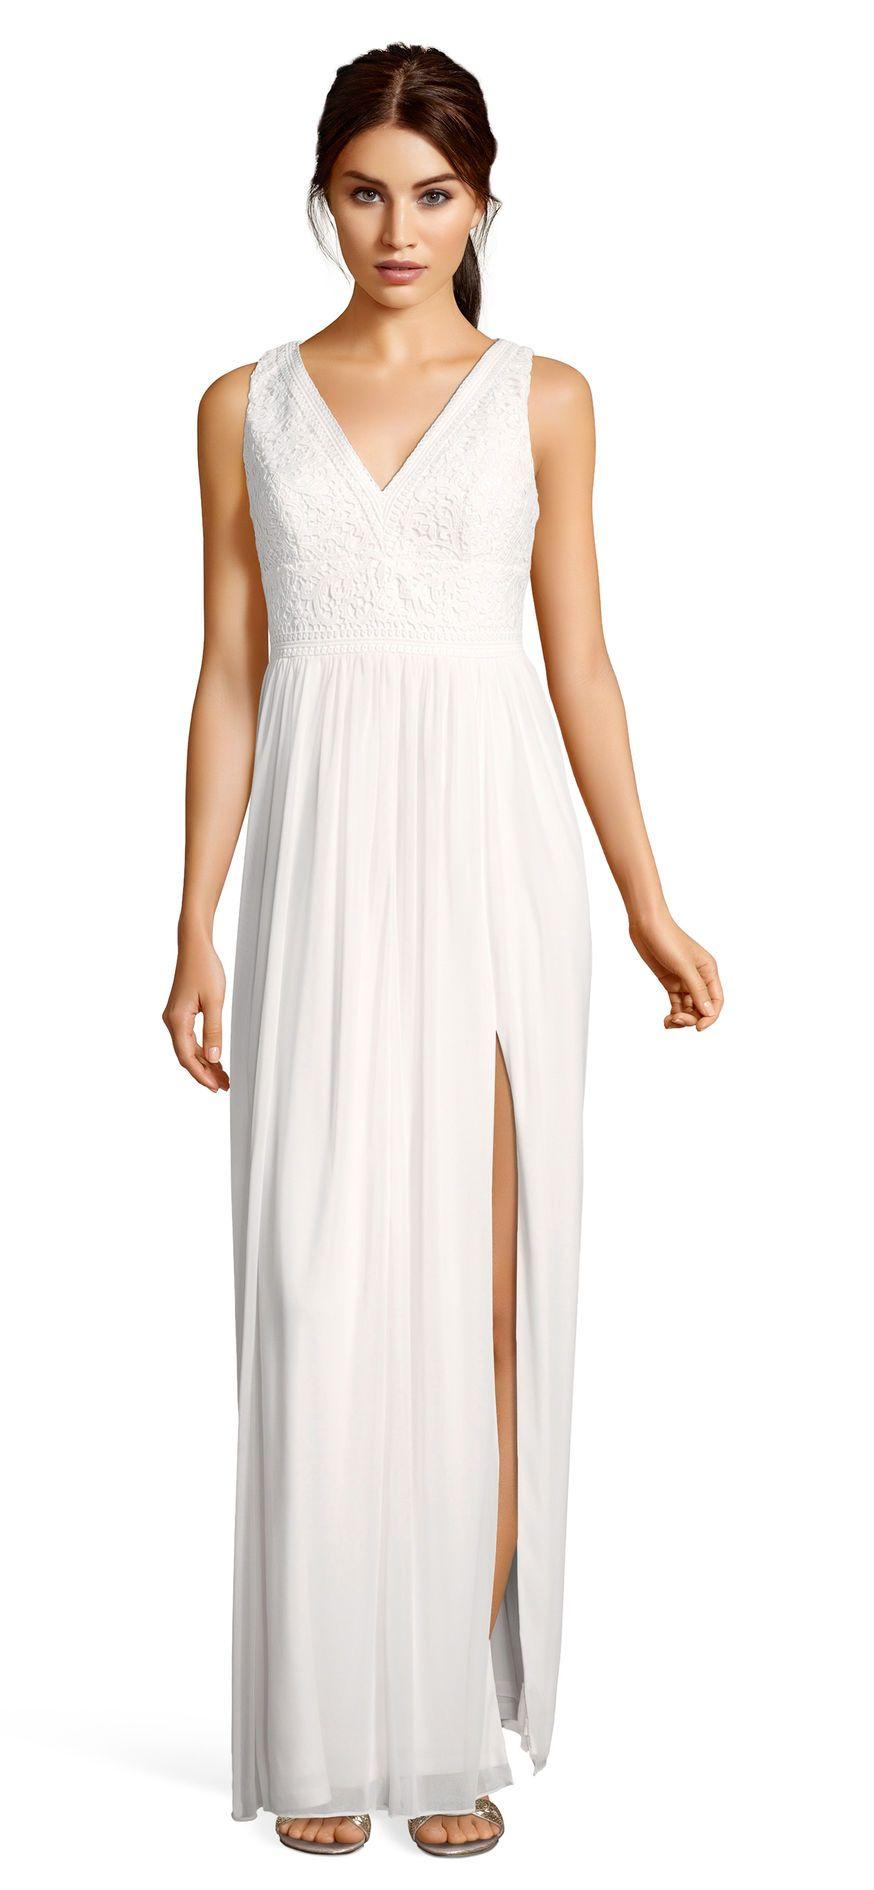 Vintage-Inspired Wedding Dresses Casual